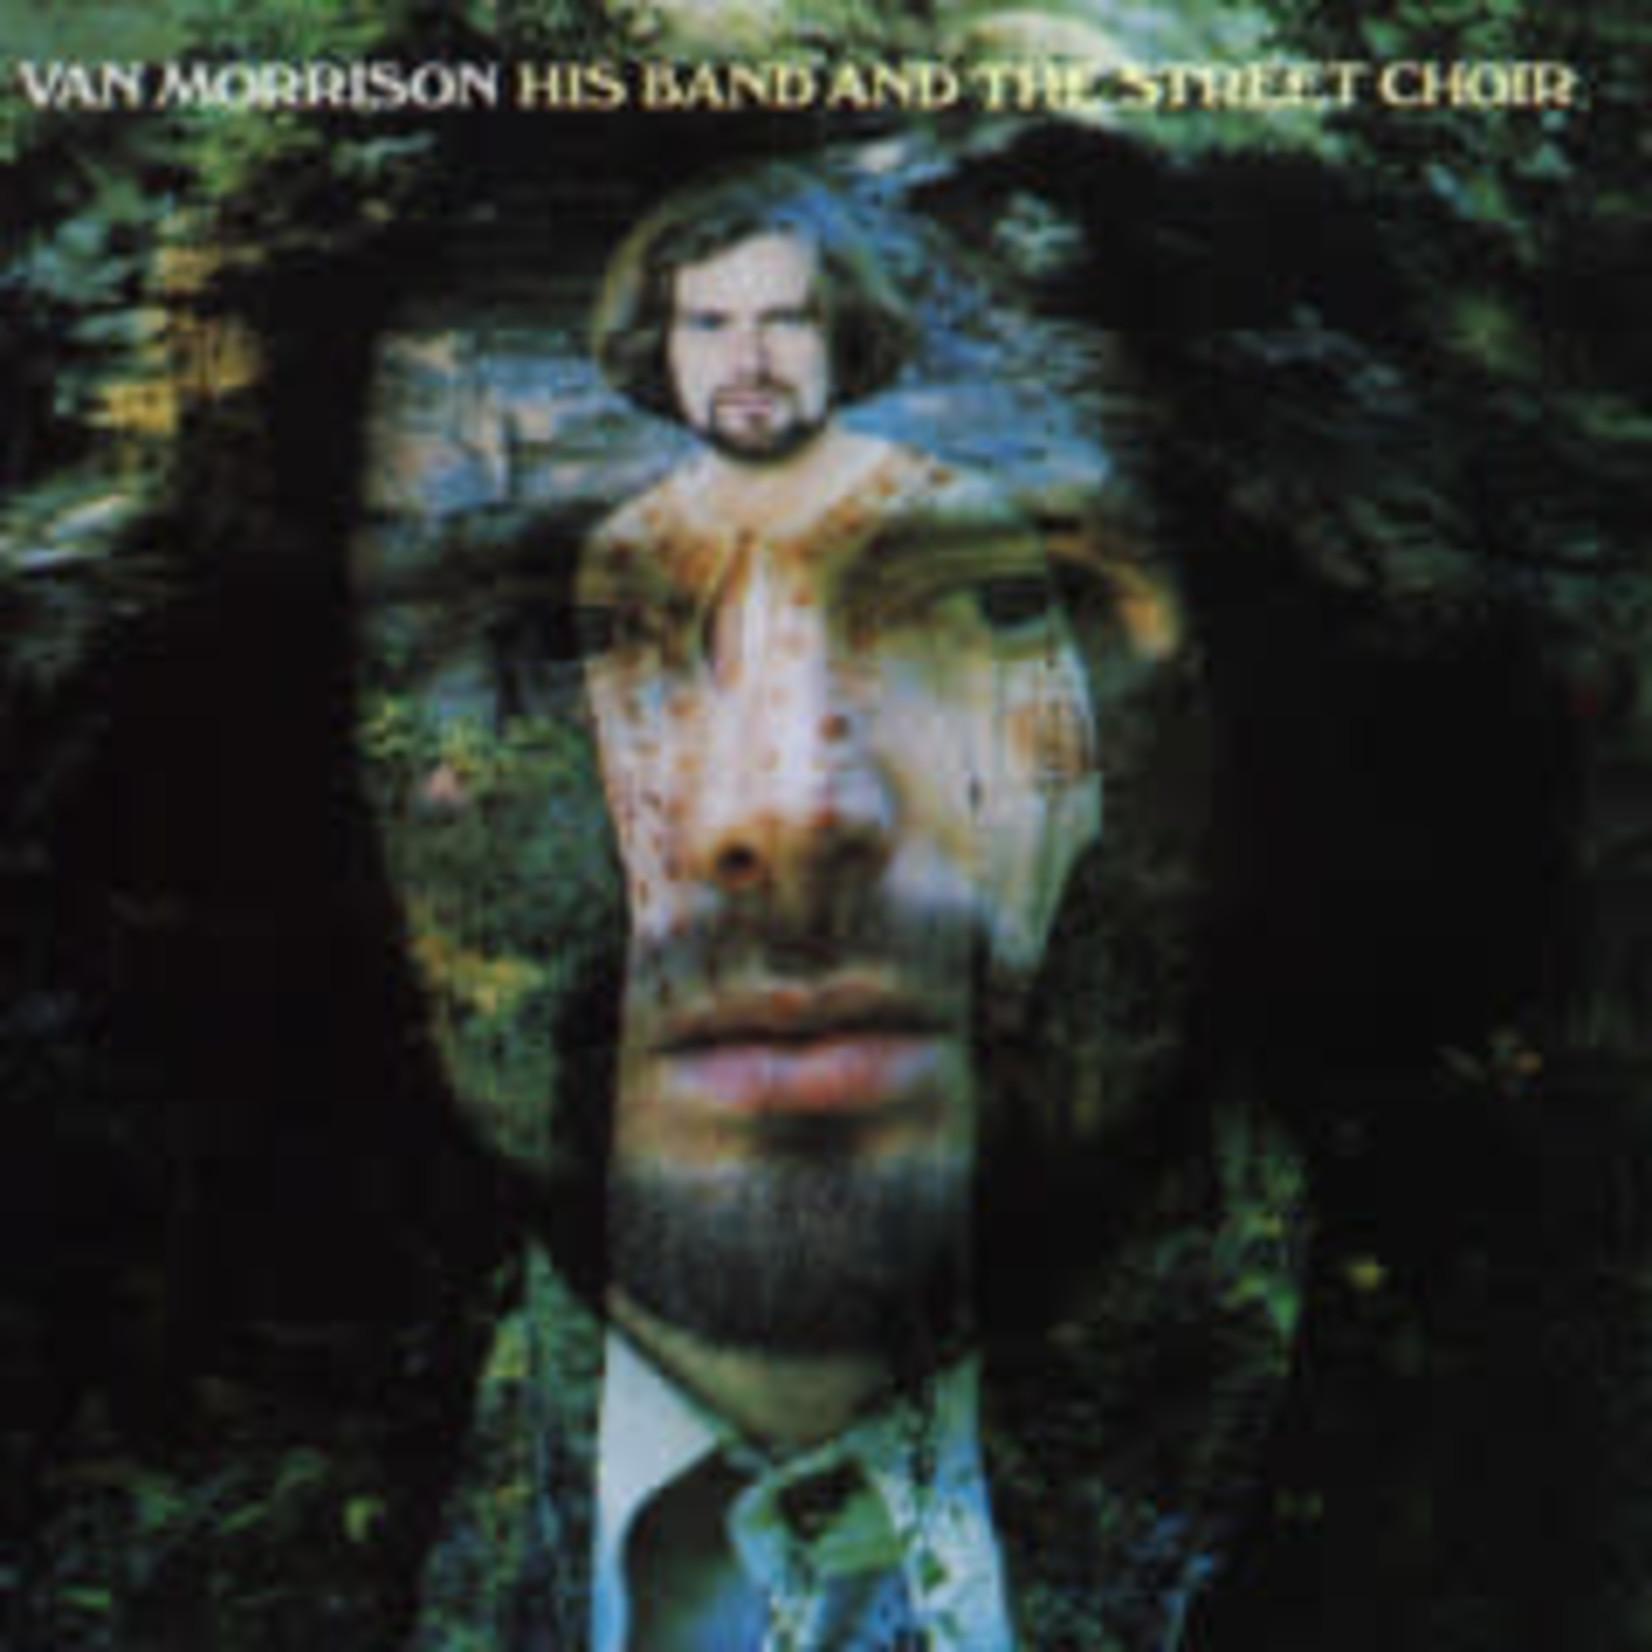 Vinyl Van Morrison - His Band andThe Street Choir (Green Vinyl)